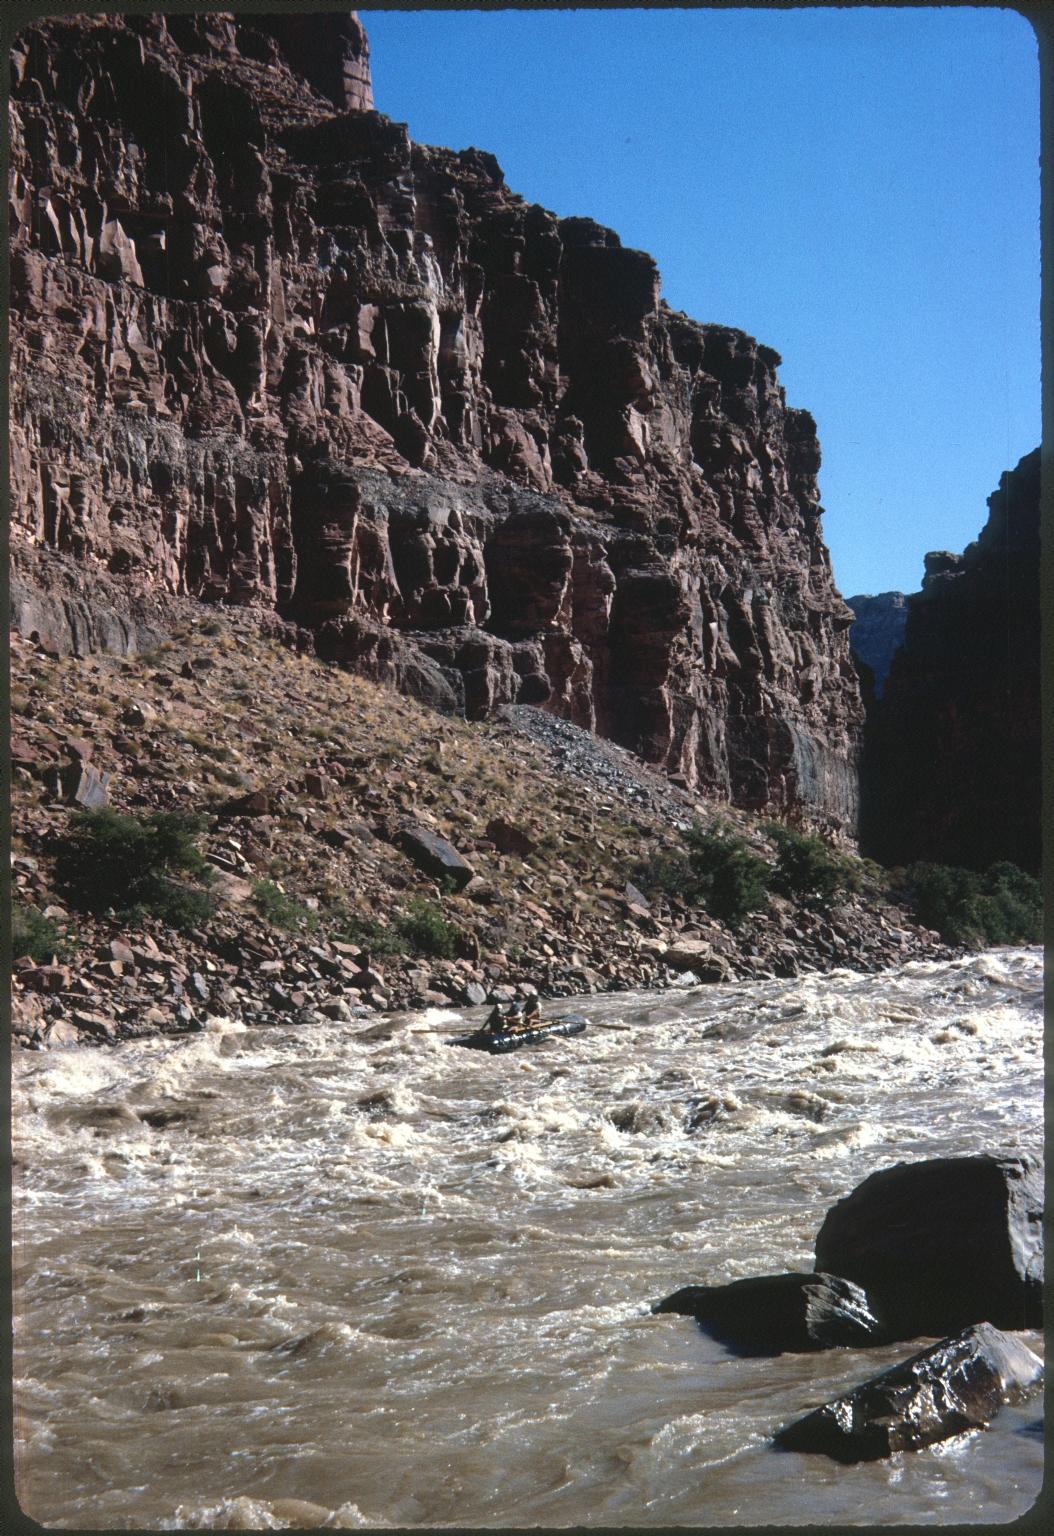 Rafters navigating rapids